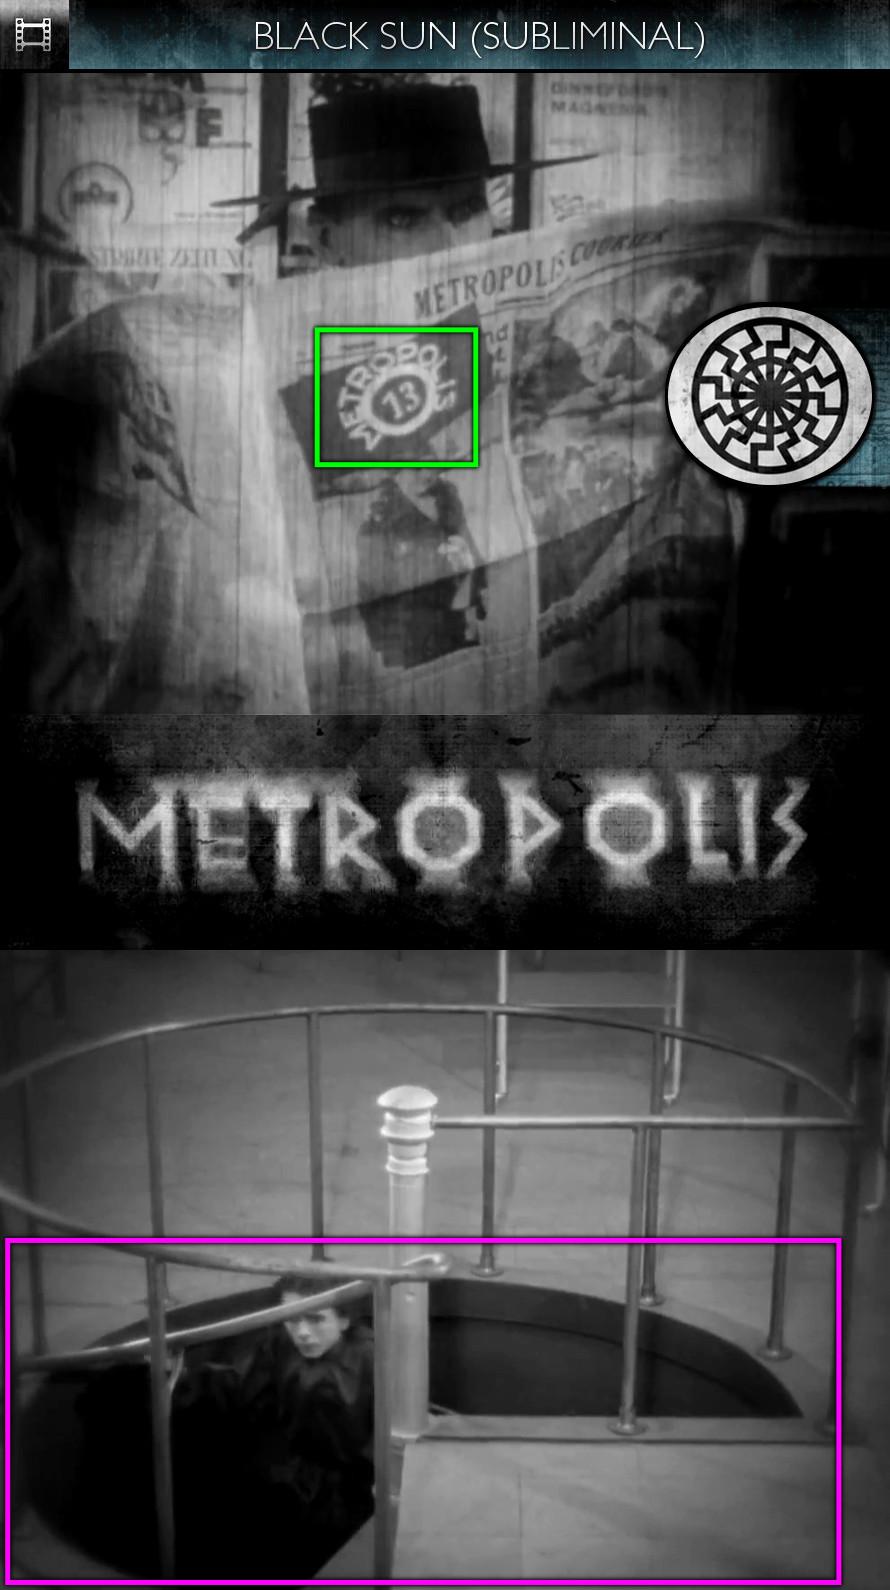 Metropolis (1927) - Black Sun - Subliminal